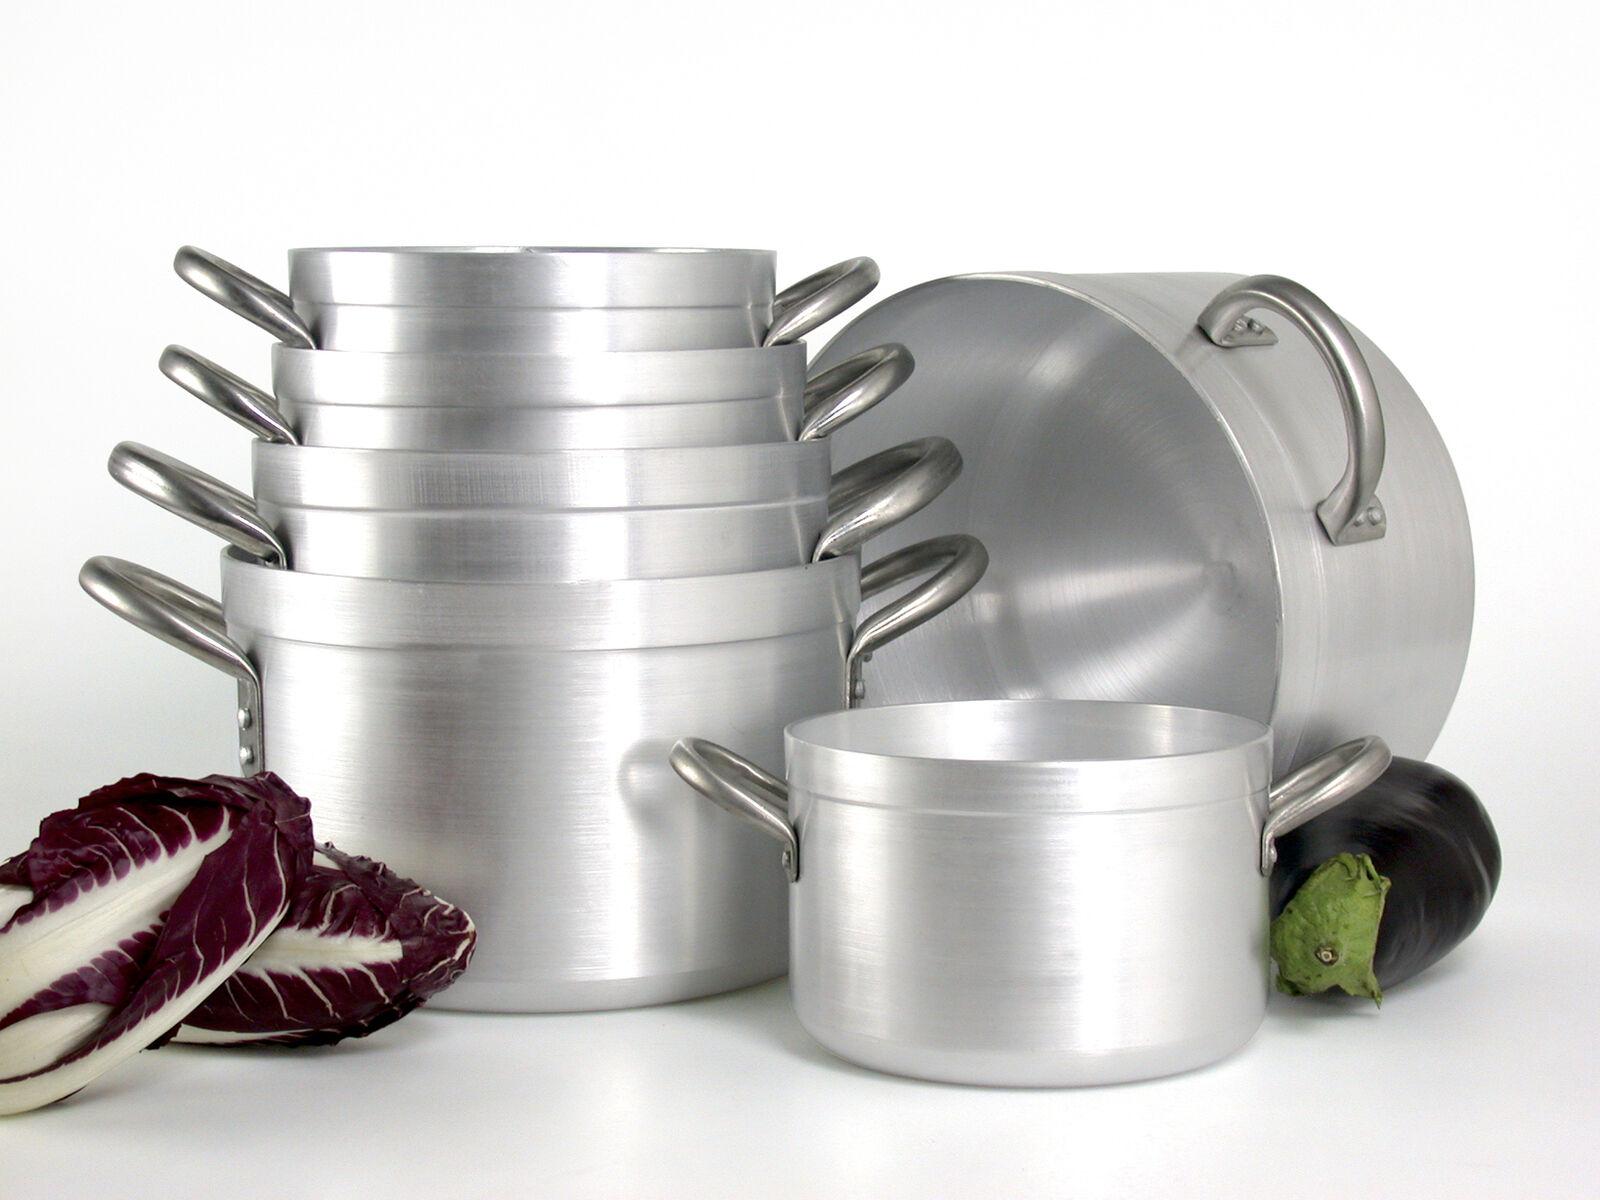 PARDINI Casseruola alluminio albergo alta 2 manici 10 pentola da cucina